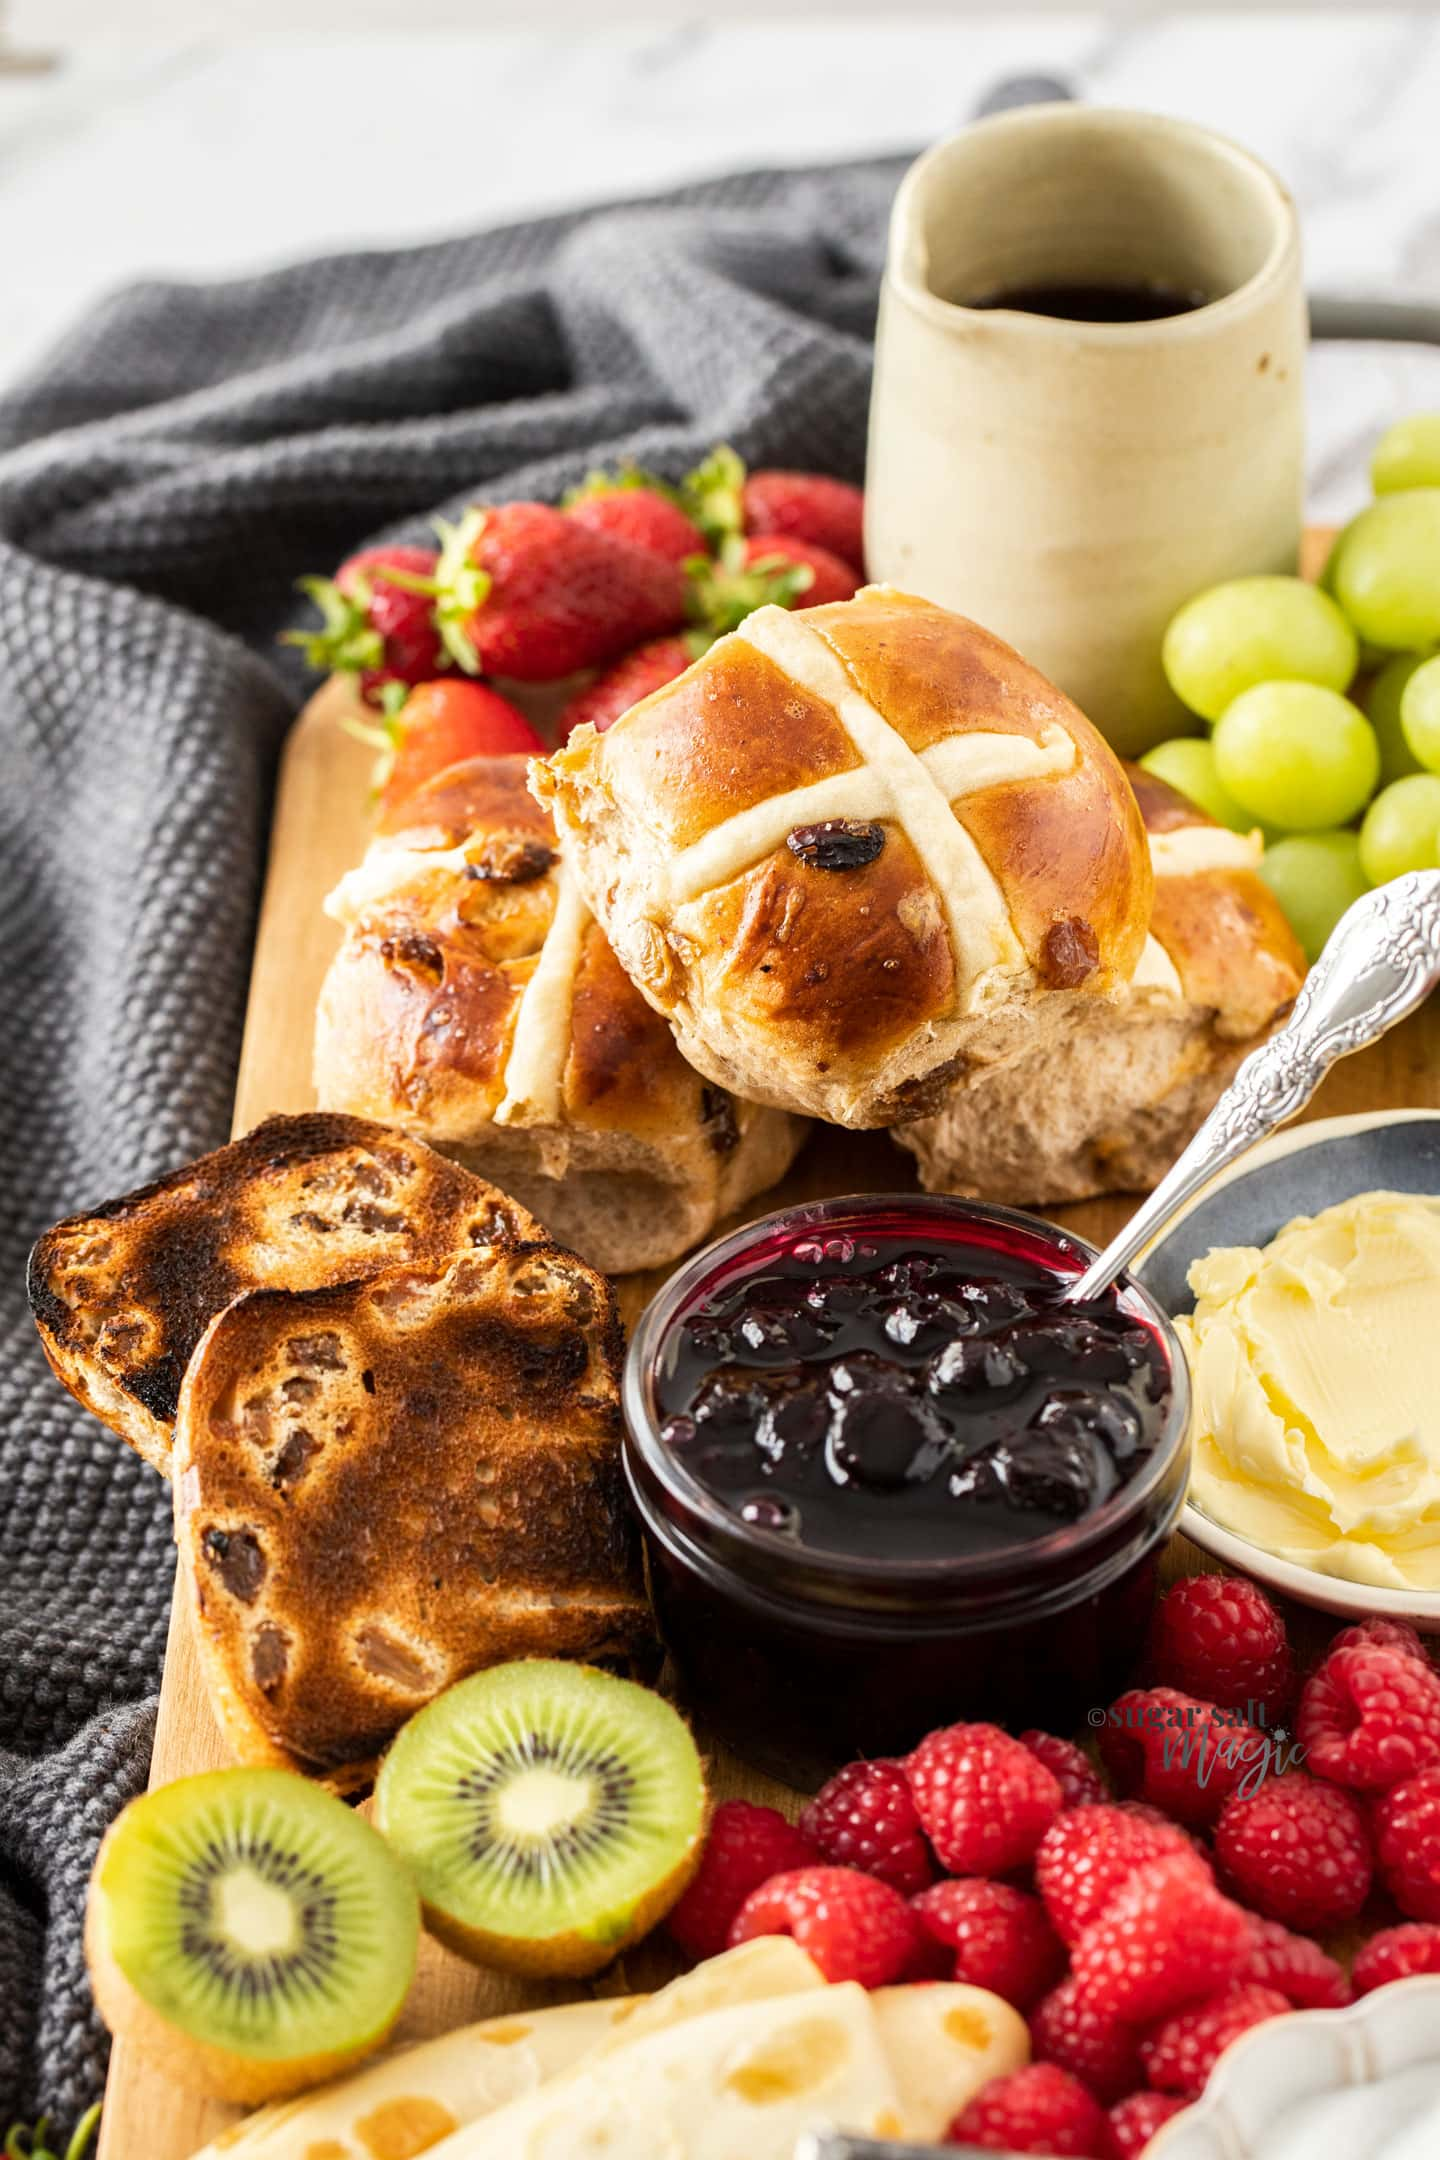 Hot cross buns on a breakfast platter.